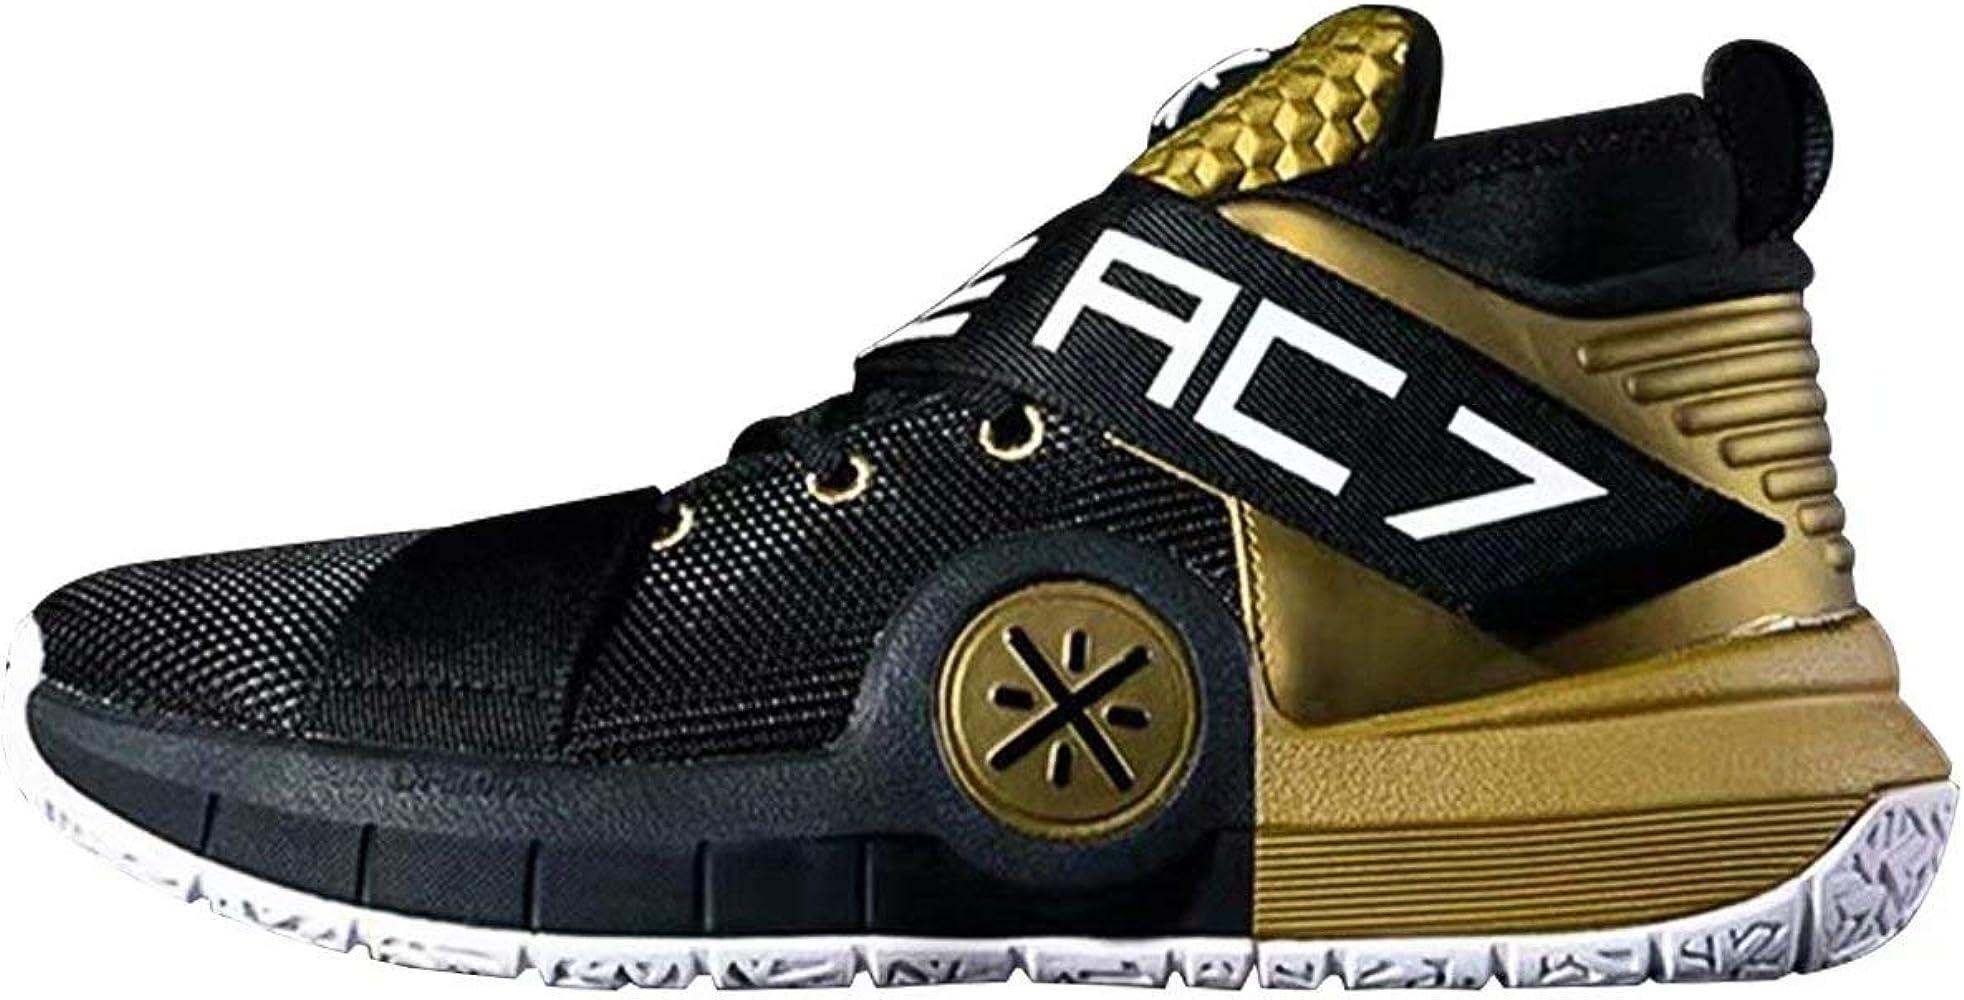 City 7 Wade Men Basketball Shoes Lining